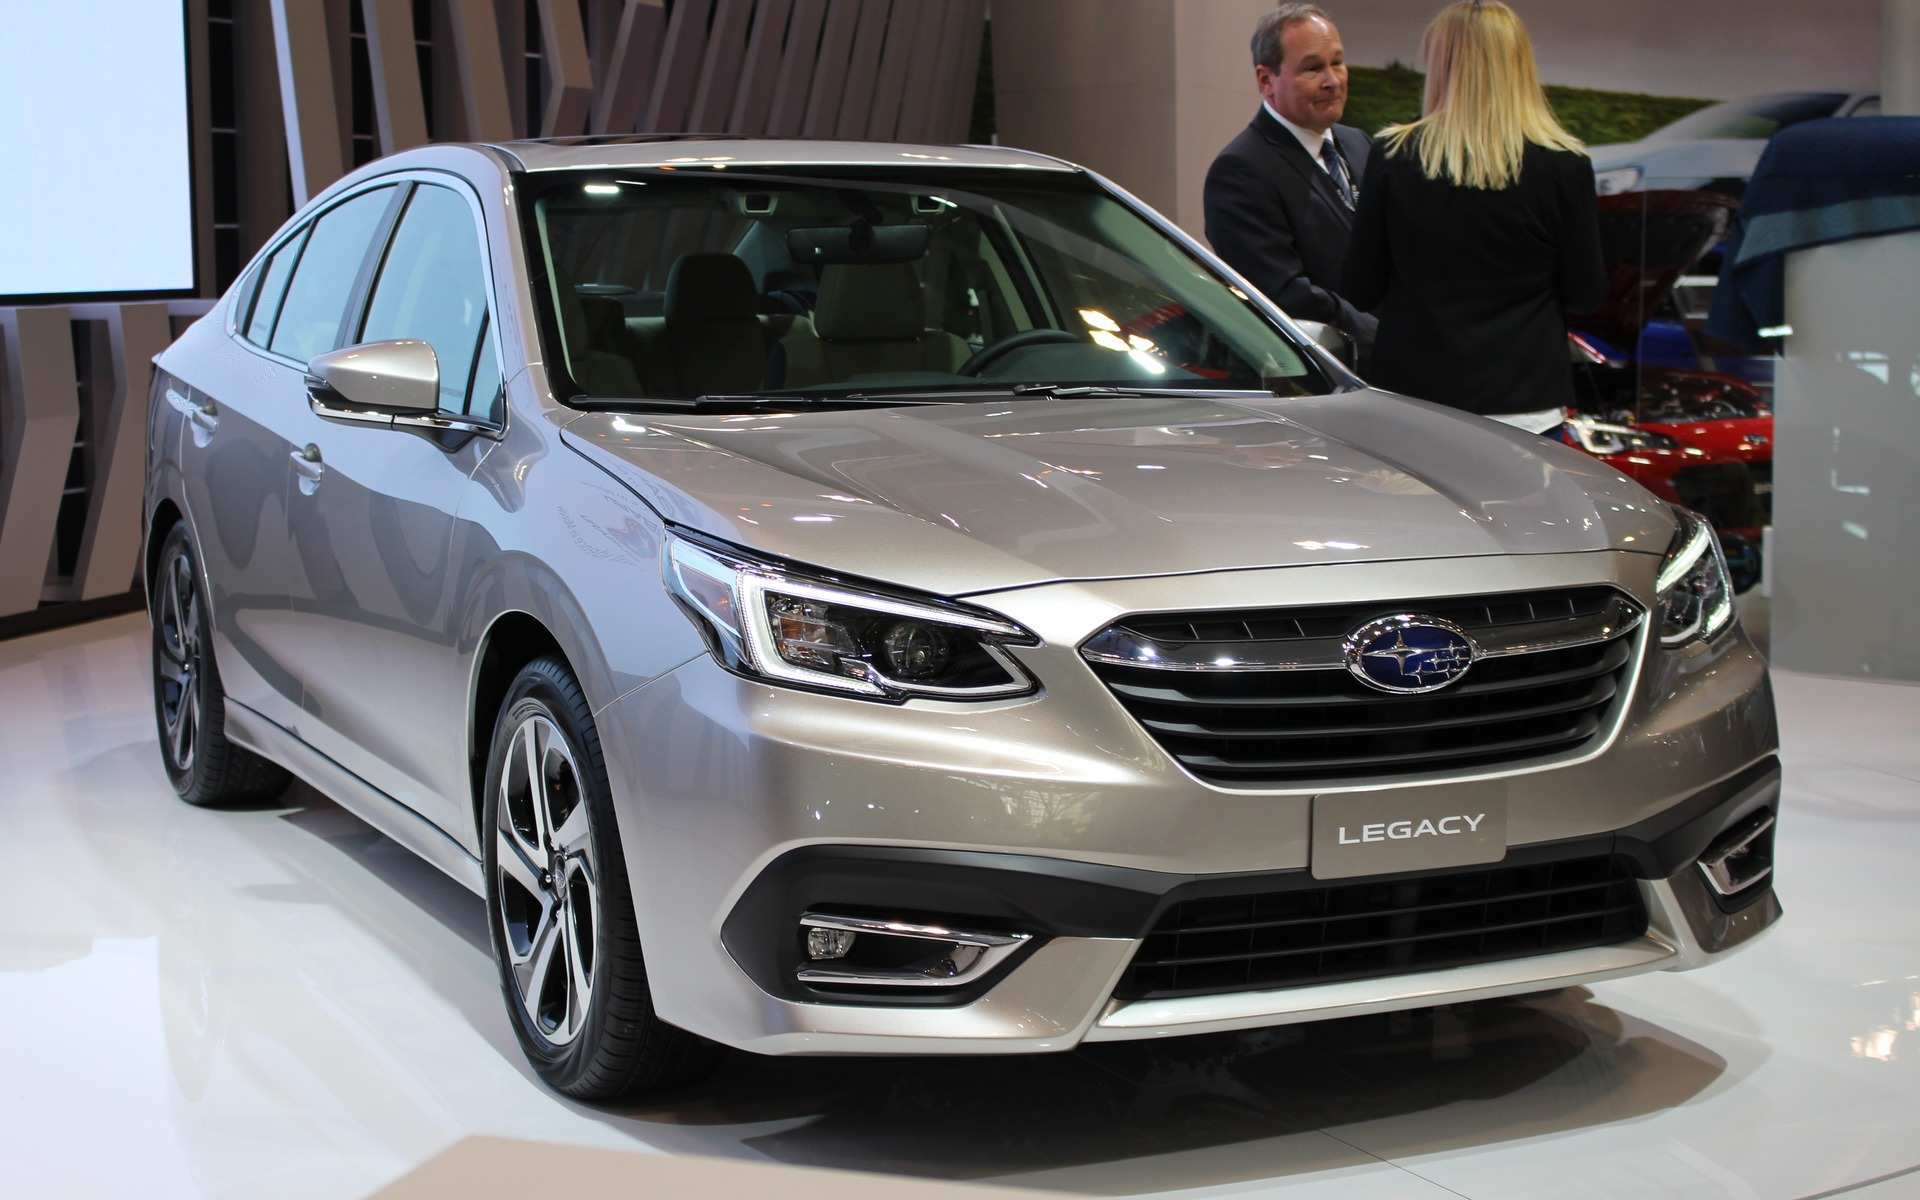 87 New 2020 Subaru Legacy Price Release for 2020 Subaru Legacy Price